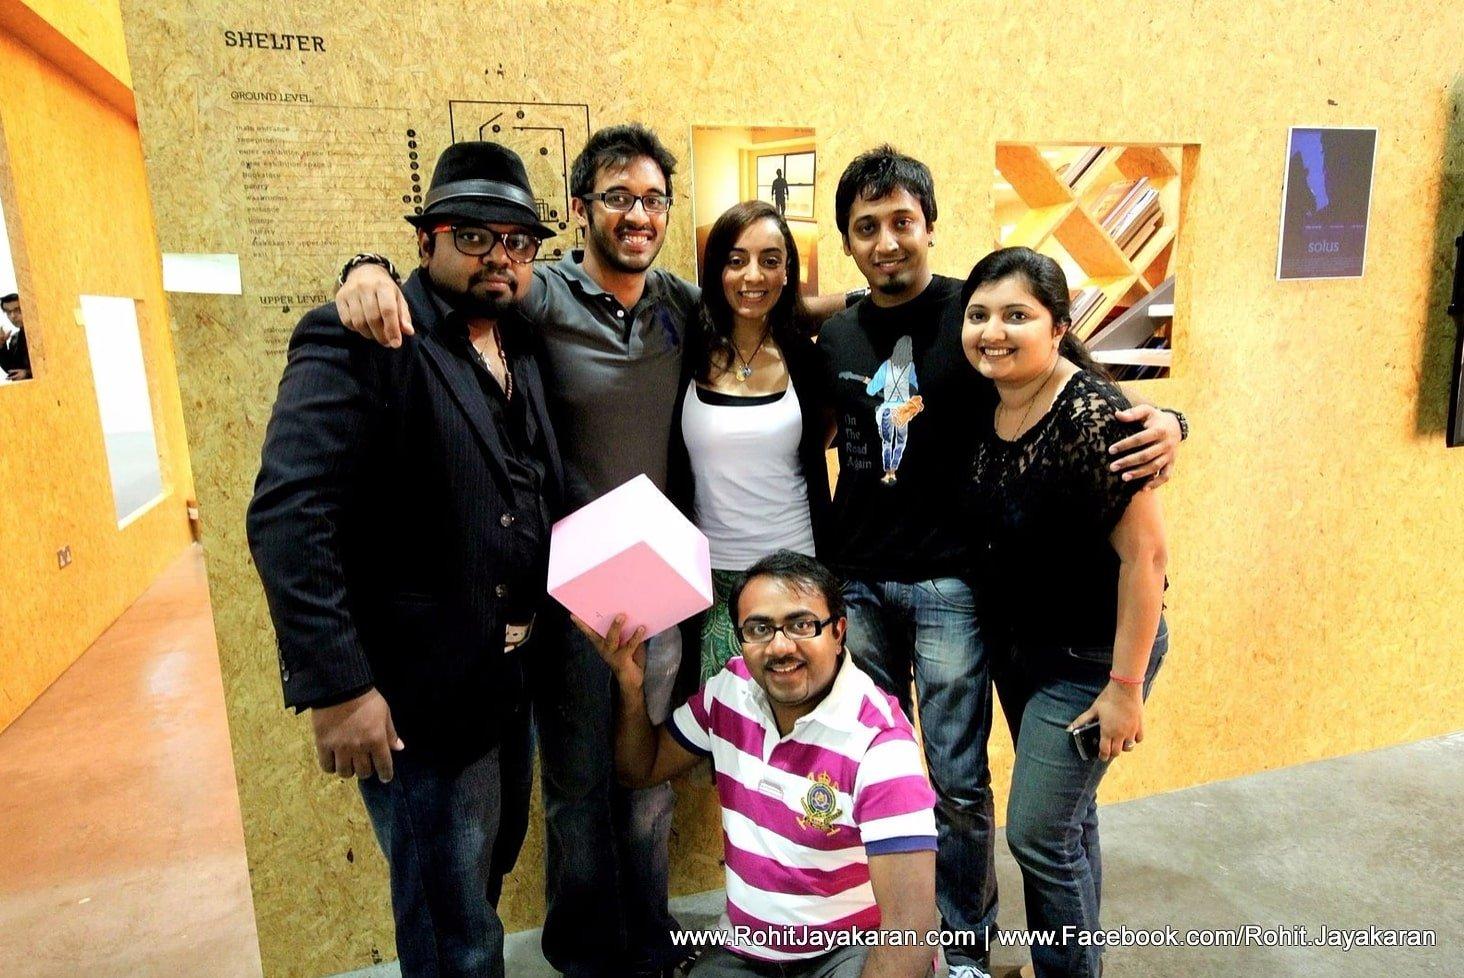 Rohit Jayakaran Film Maker Award - Best Film